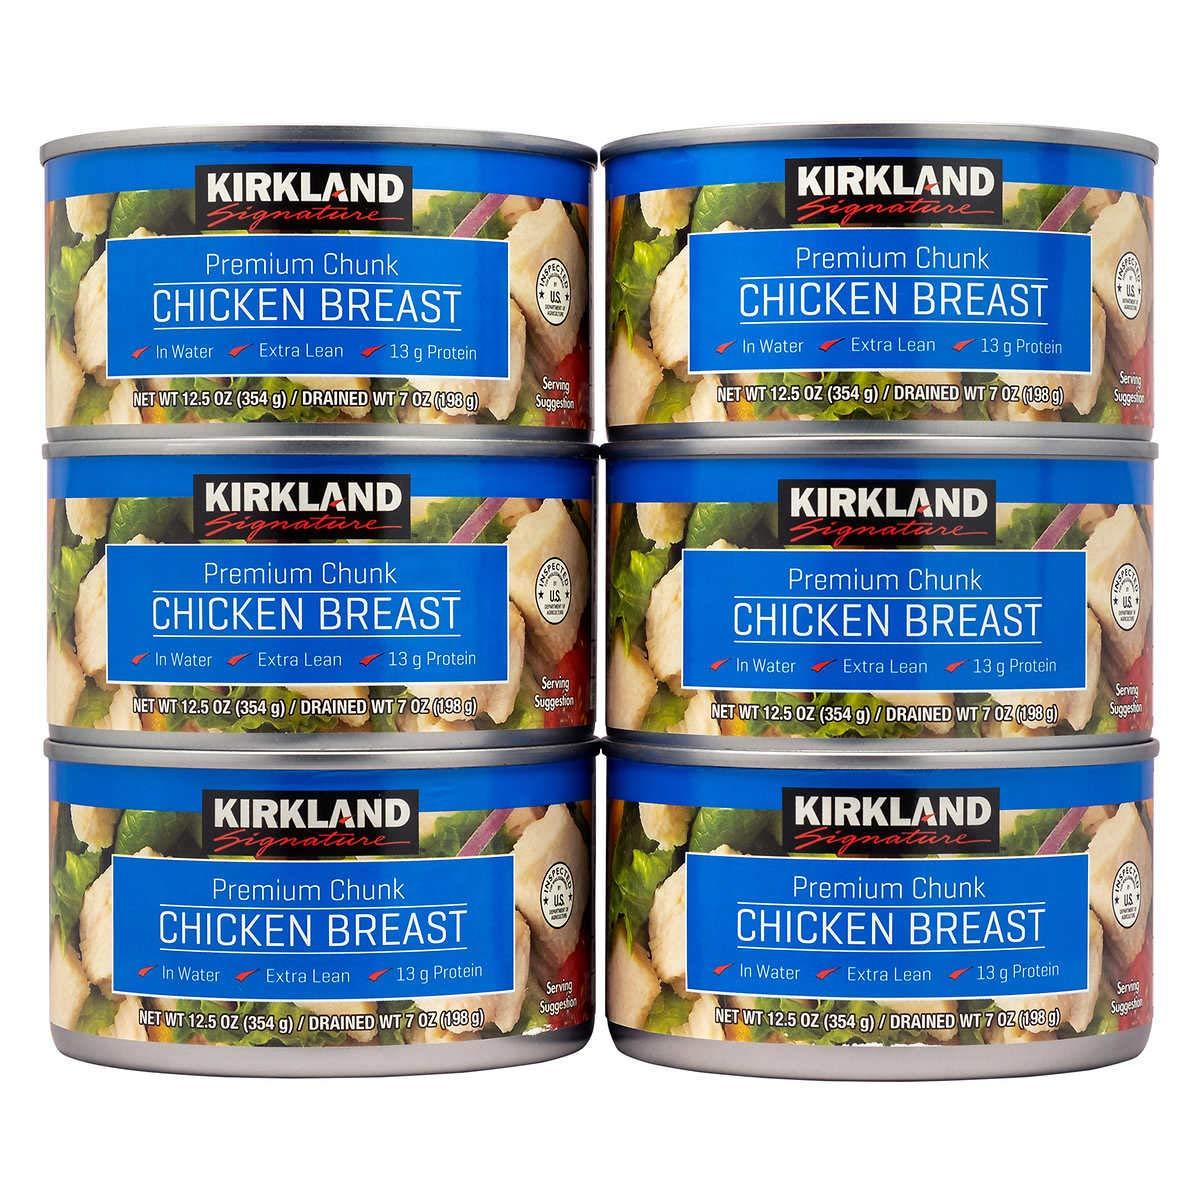 Kirkland Canned Chicken